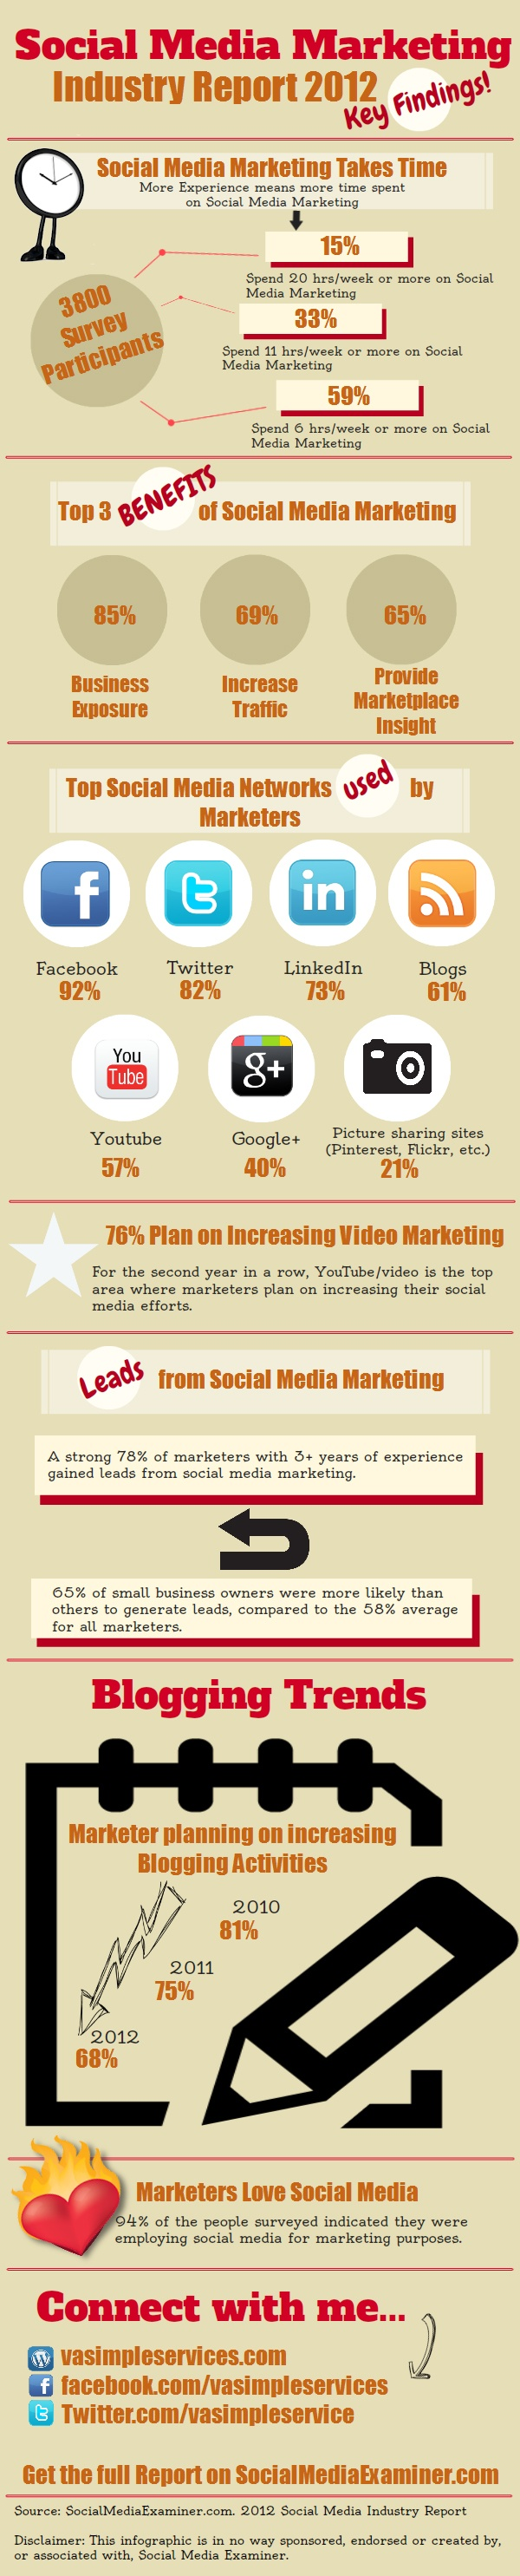 Sosyal Medya Pazarlama – 2012 Endüstri Raporu